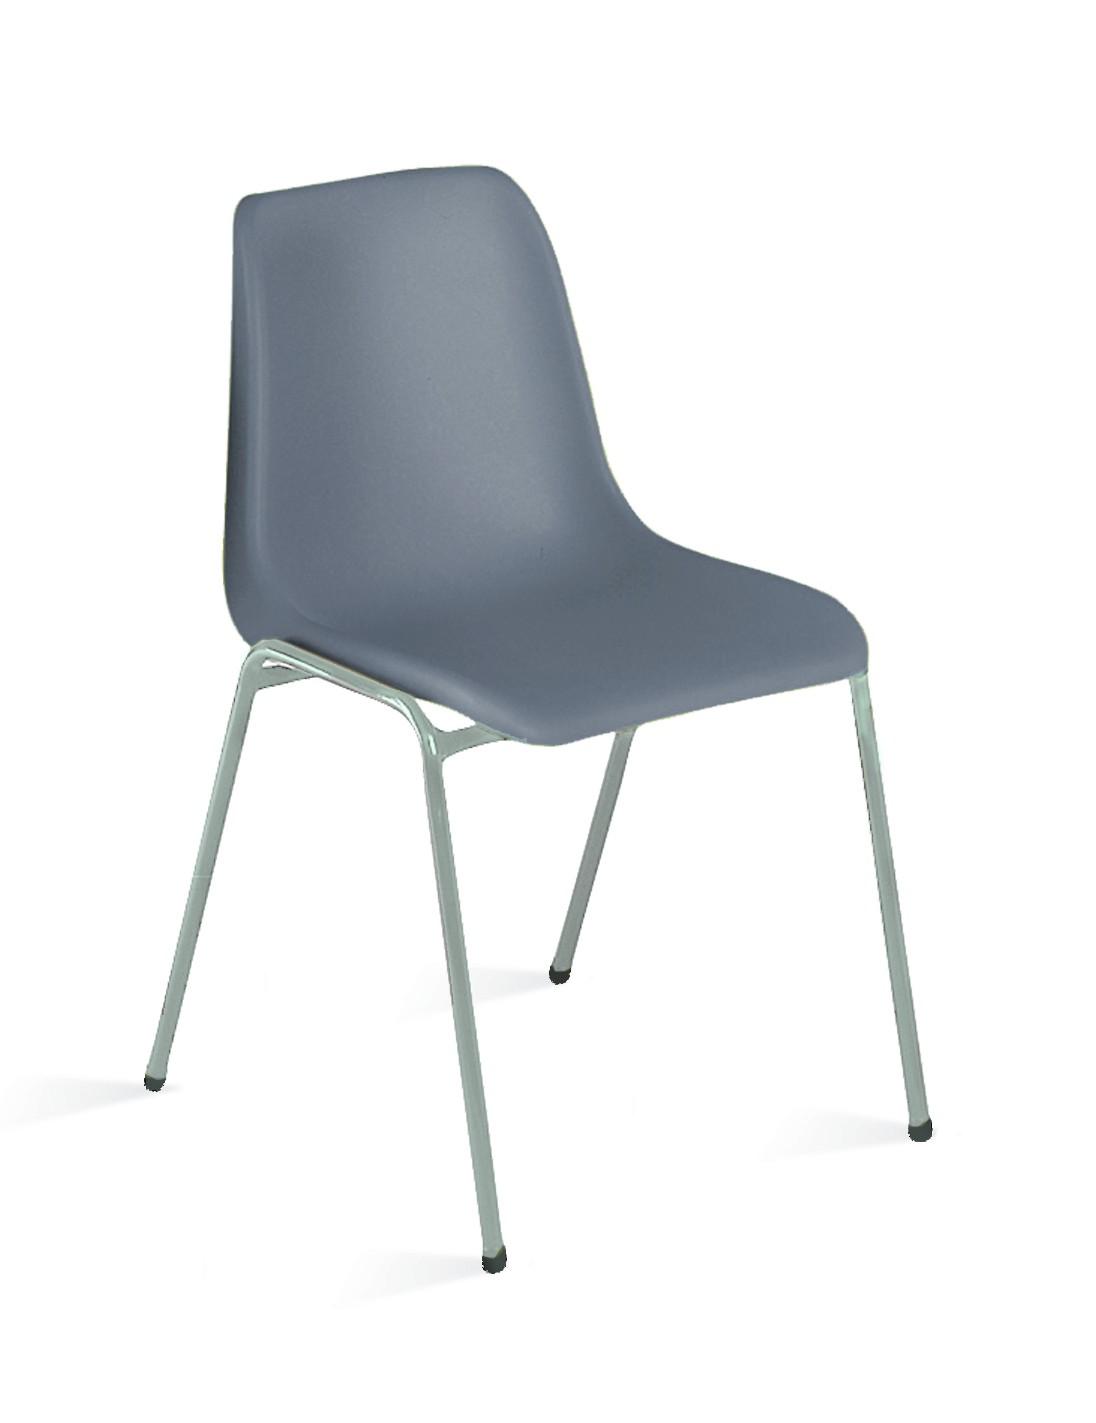 Chaise coque - Chaise coque pas cher ...